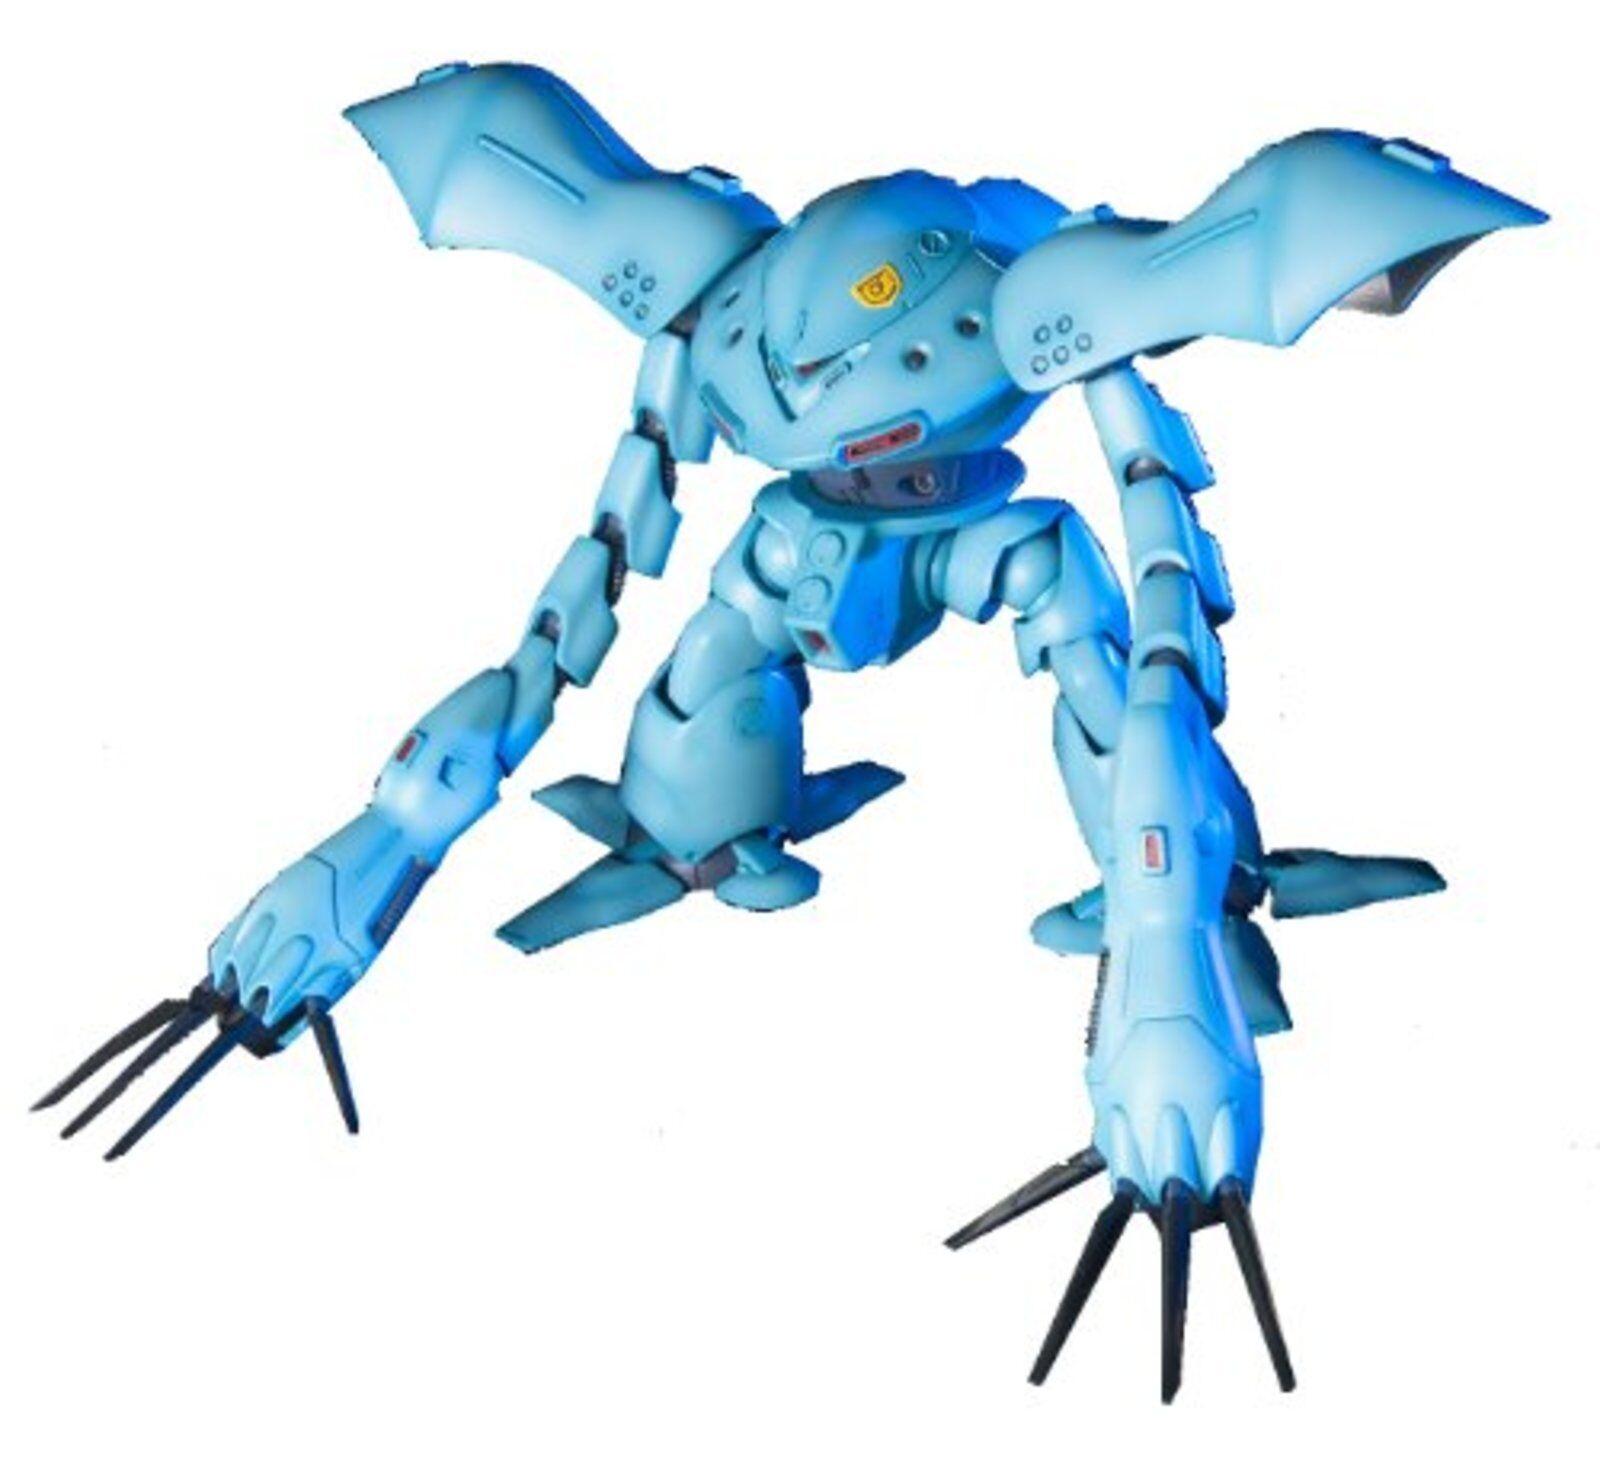 moda clasica Gundam 0080 The War Of Of Of Bolsillo Hguc Msm-03c Hygogg 1 144 F S W  Tracking    entrega gratis